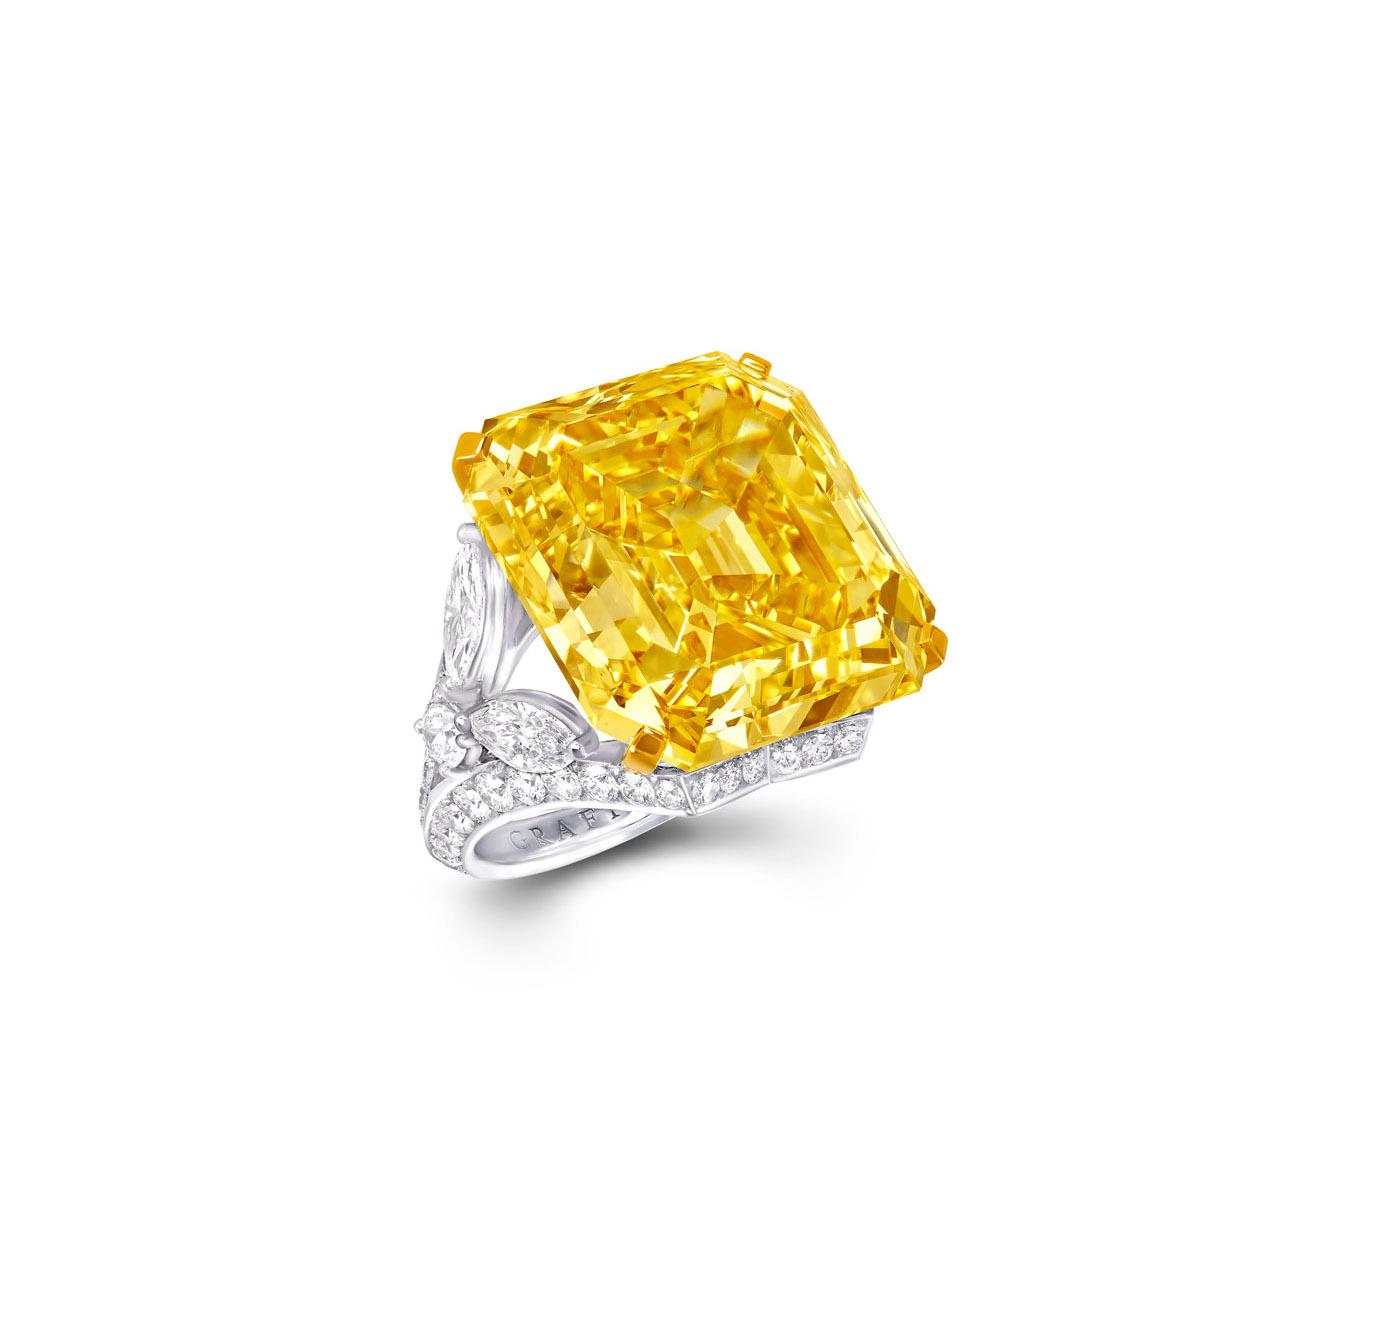 graff-yellow-diamond copy.jpg